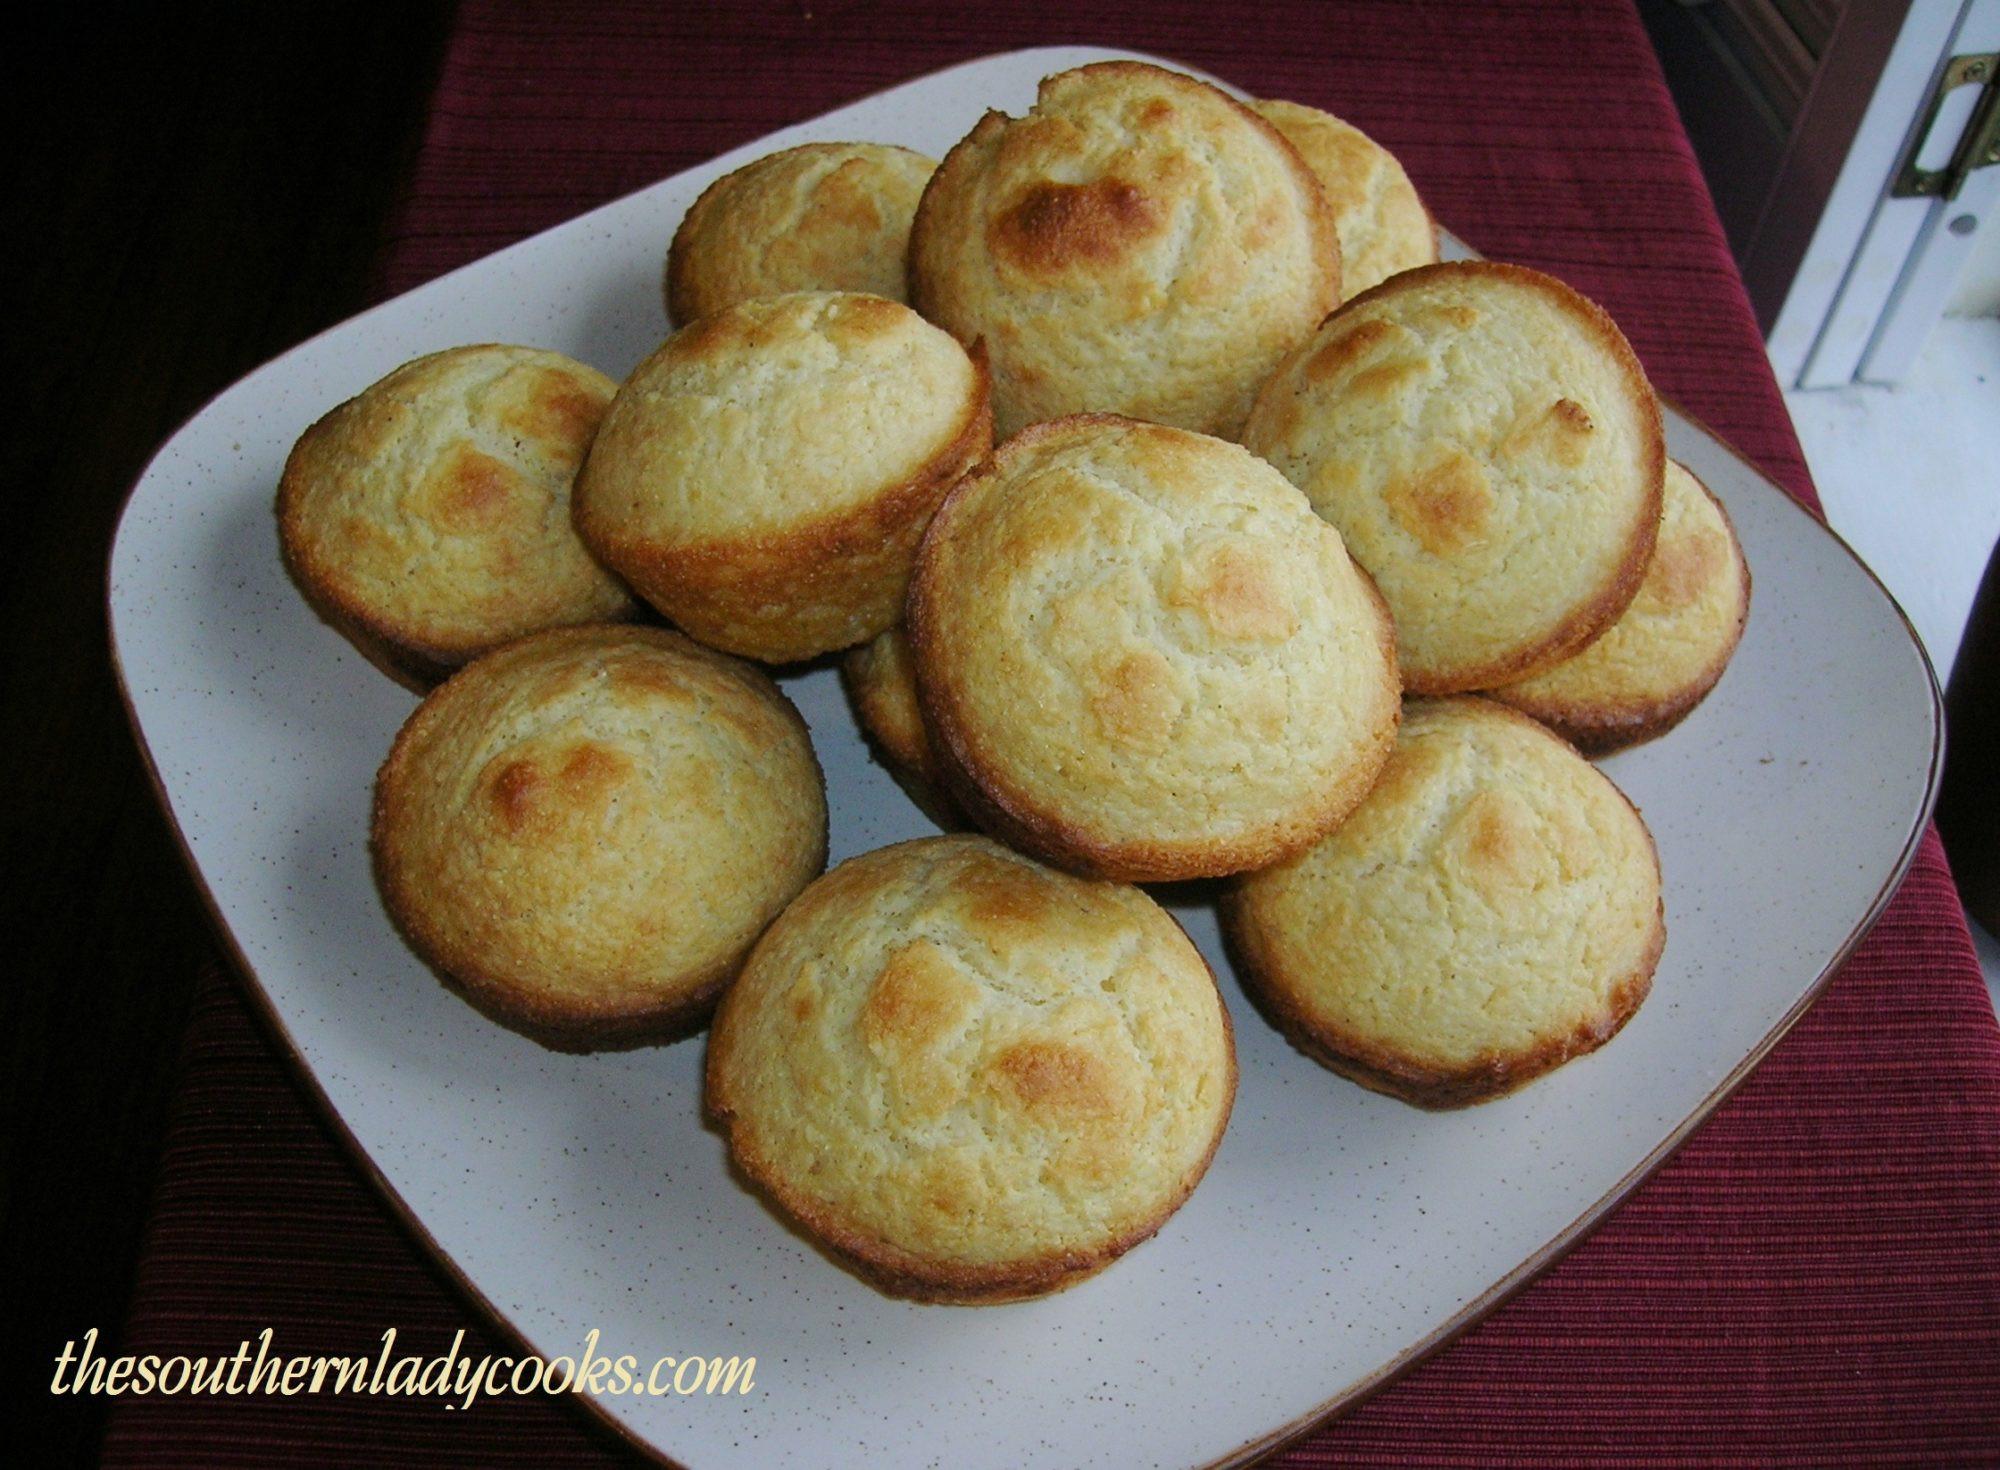 Sour Cream Cornbread  CORNBREAD MUFFINS WITH SOUR CREAM The Southern Lady Cooks